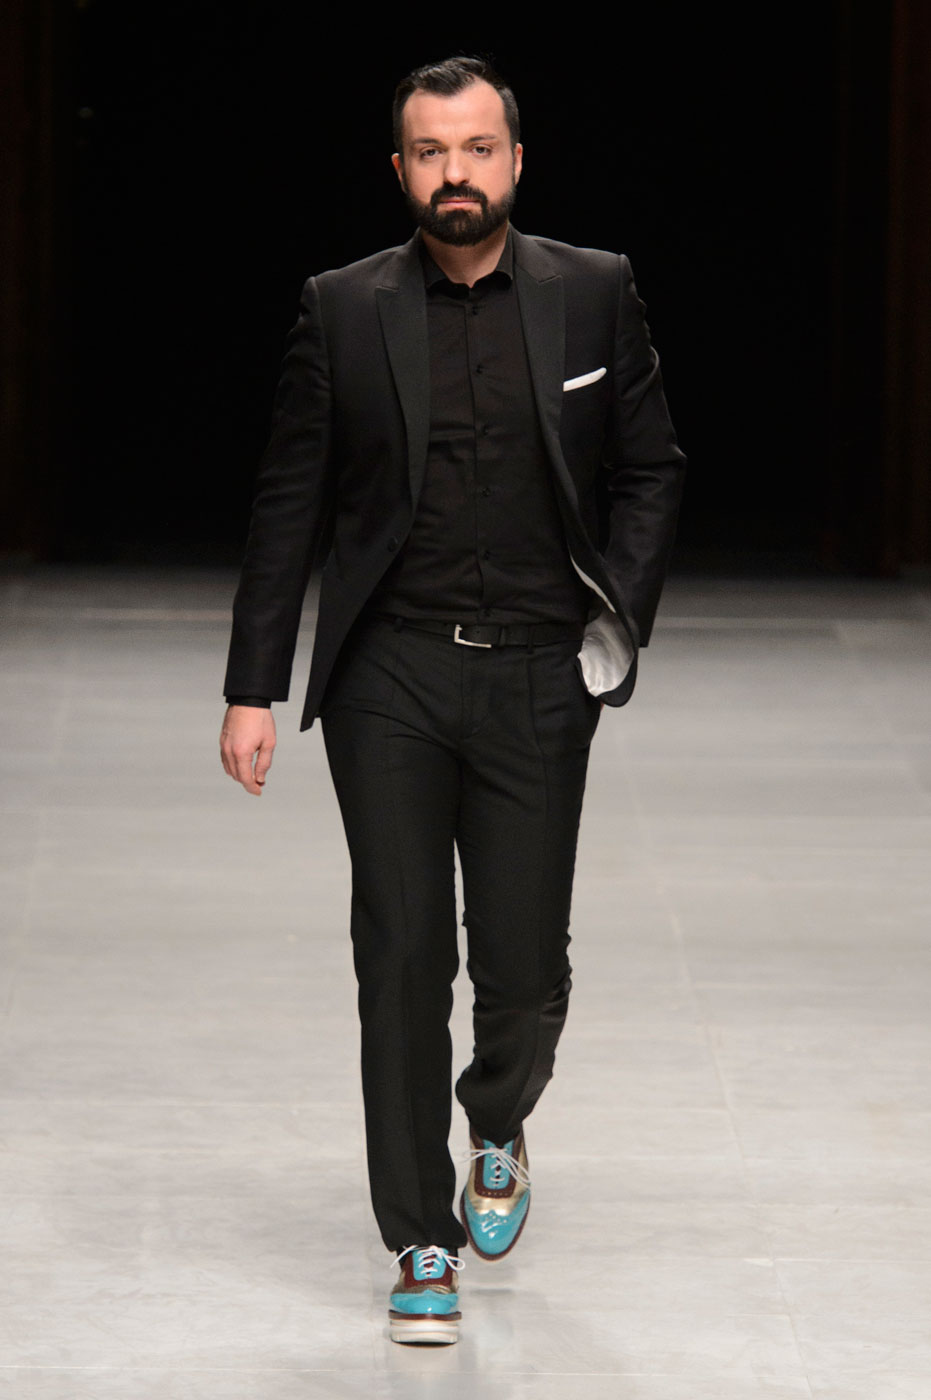 Julien-Fournie-Prive-fashion-runway-show-haute-couture-paris-spring-2015-the-impression-62